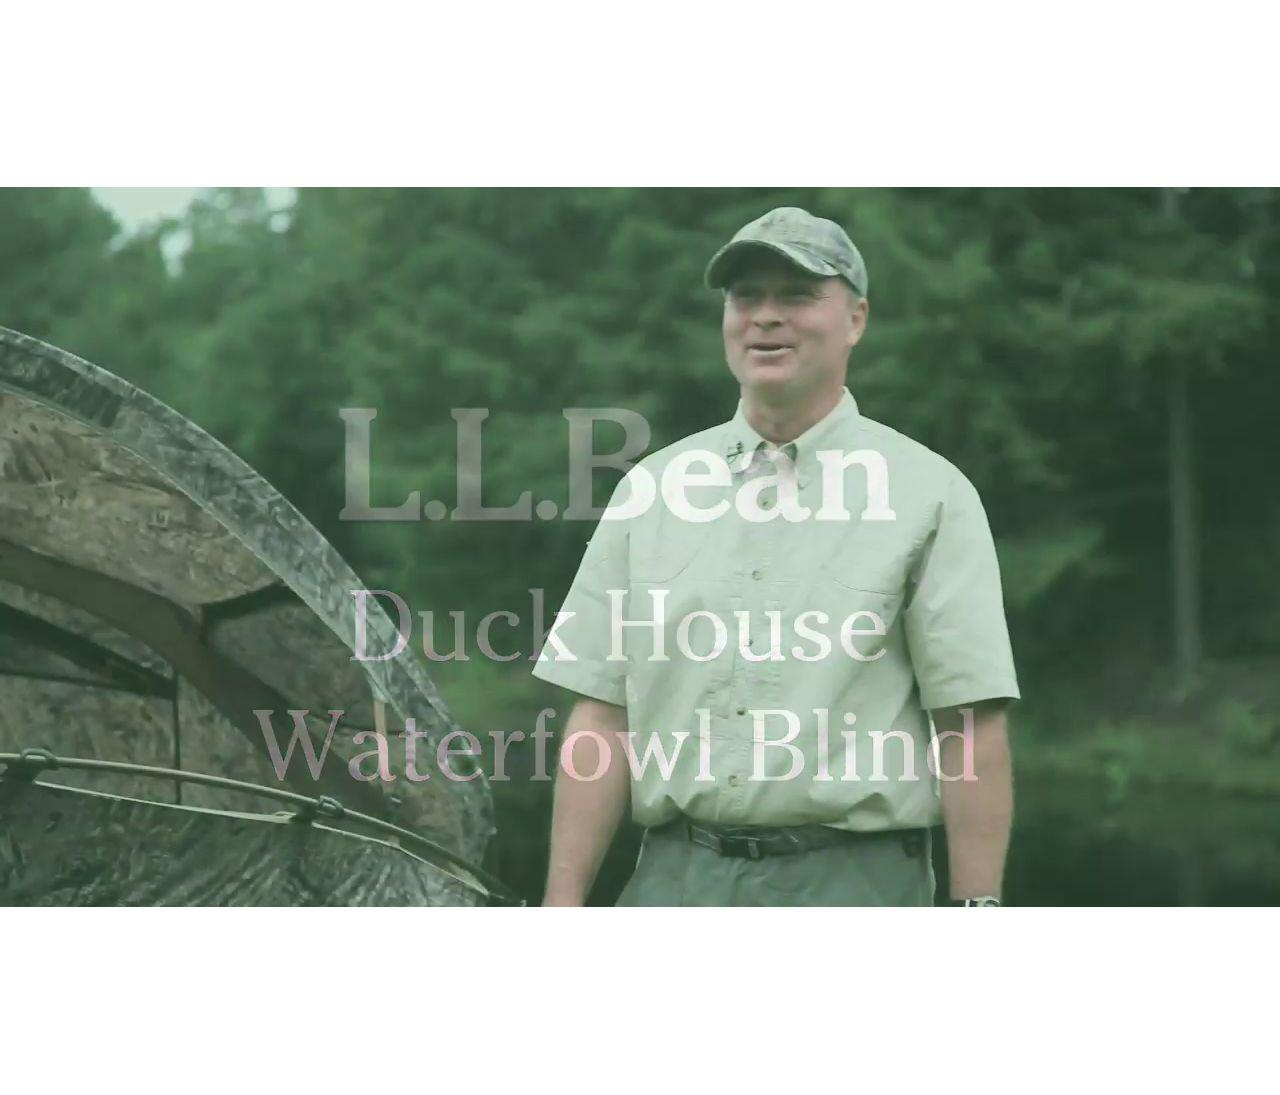 Video: Duck House Waterfowl Blind